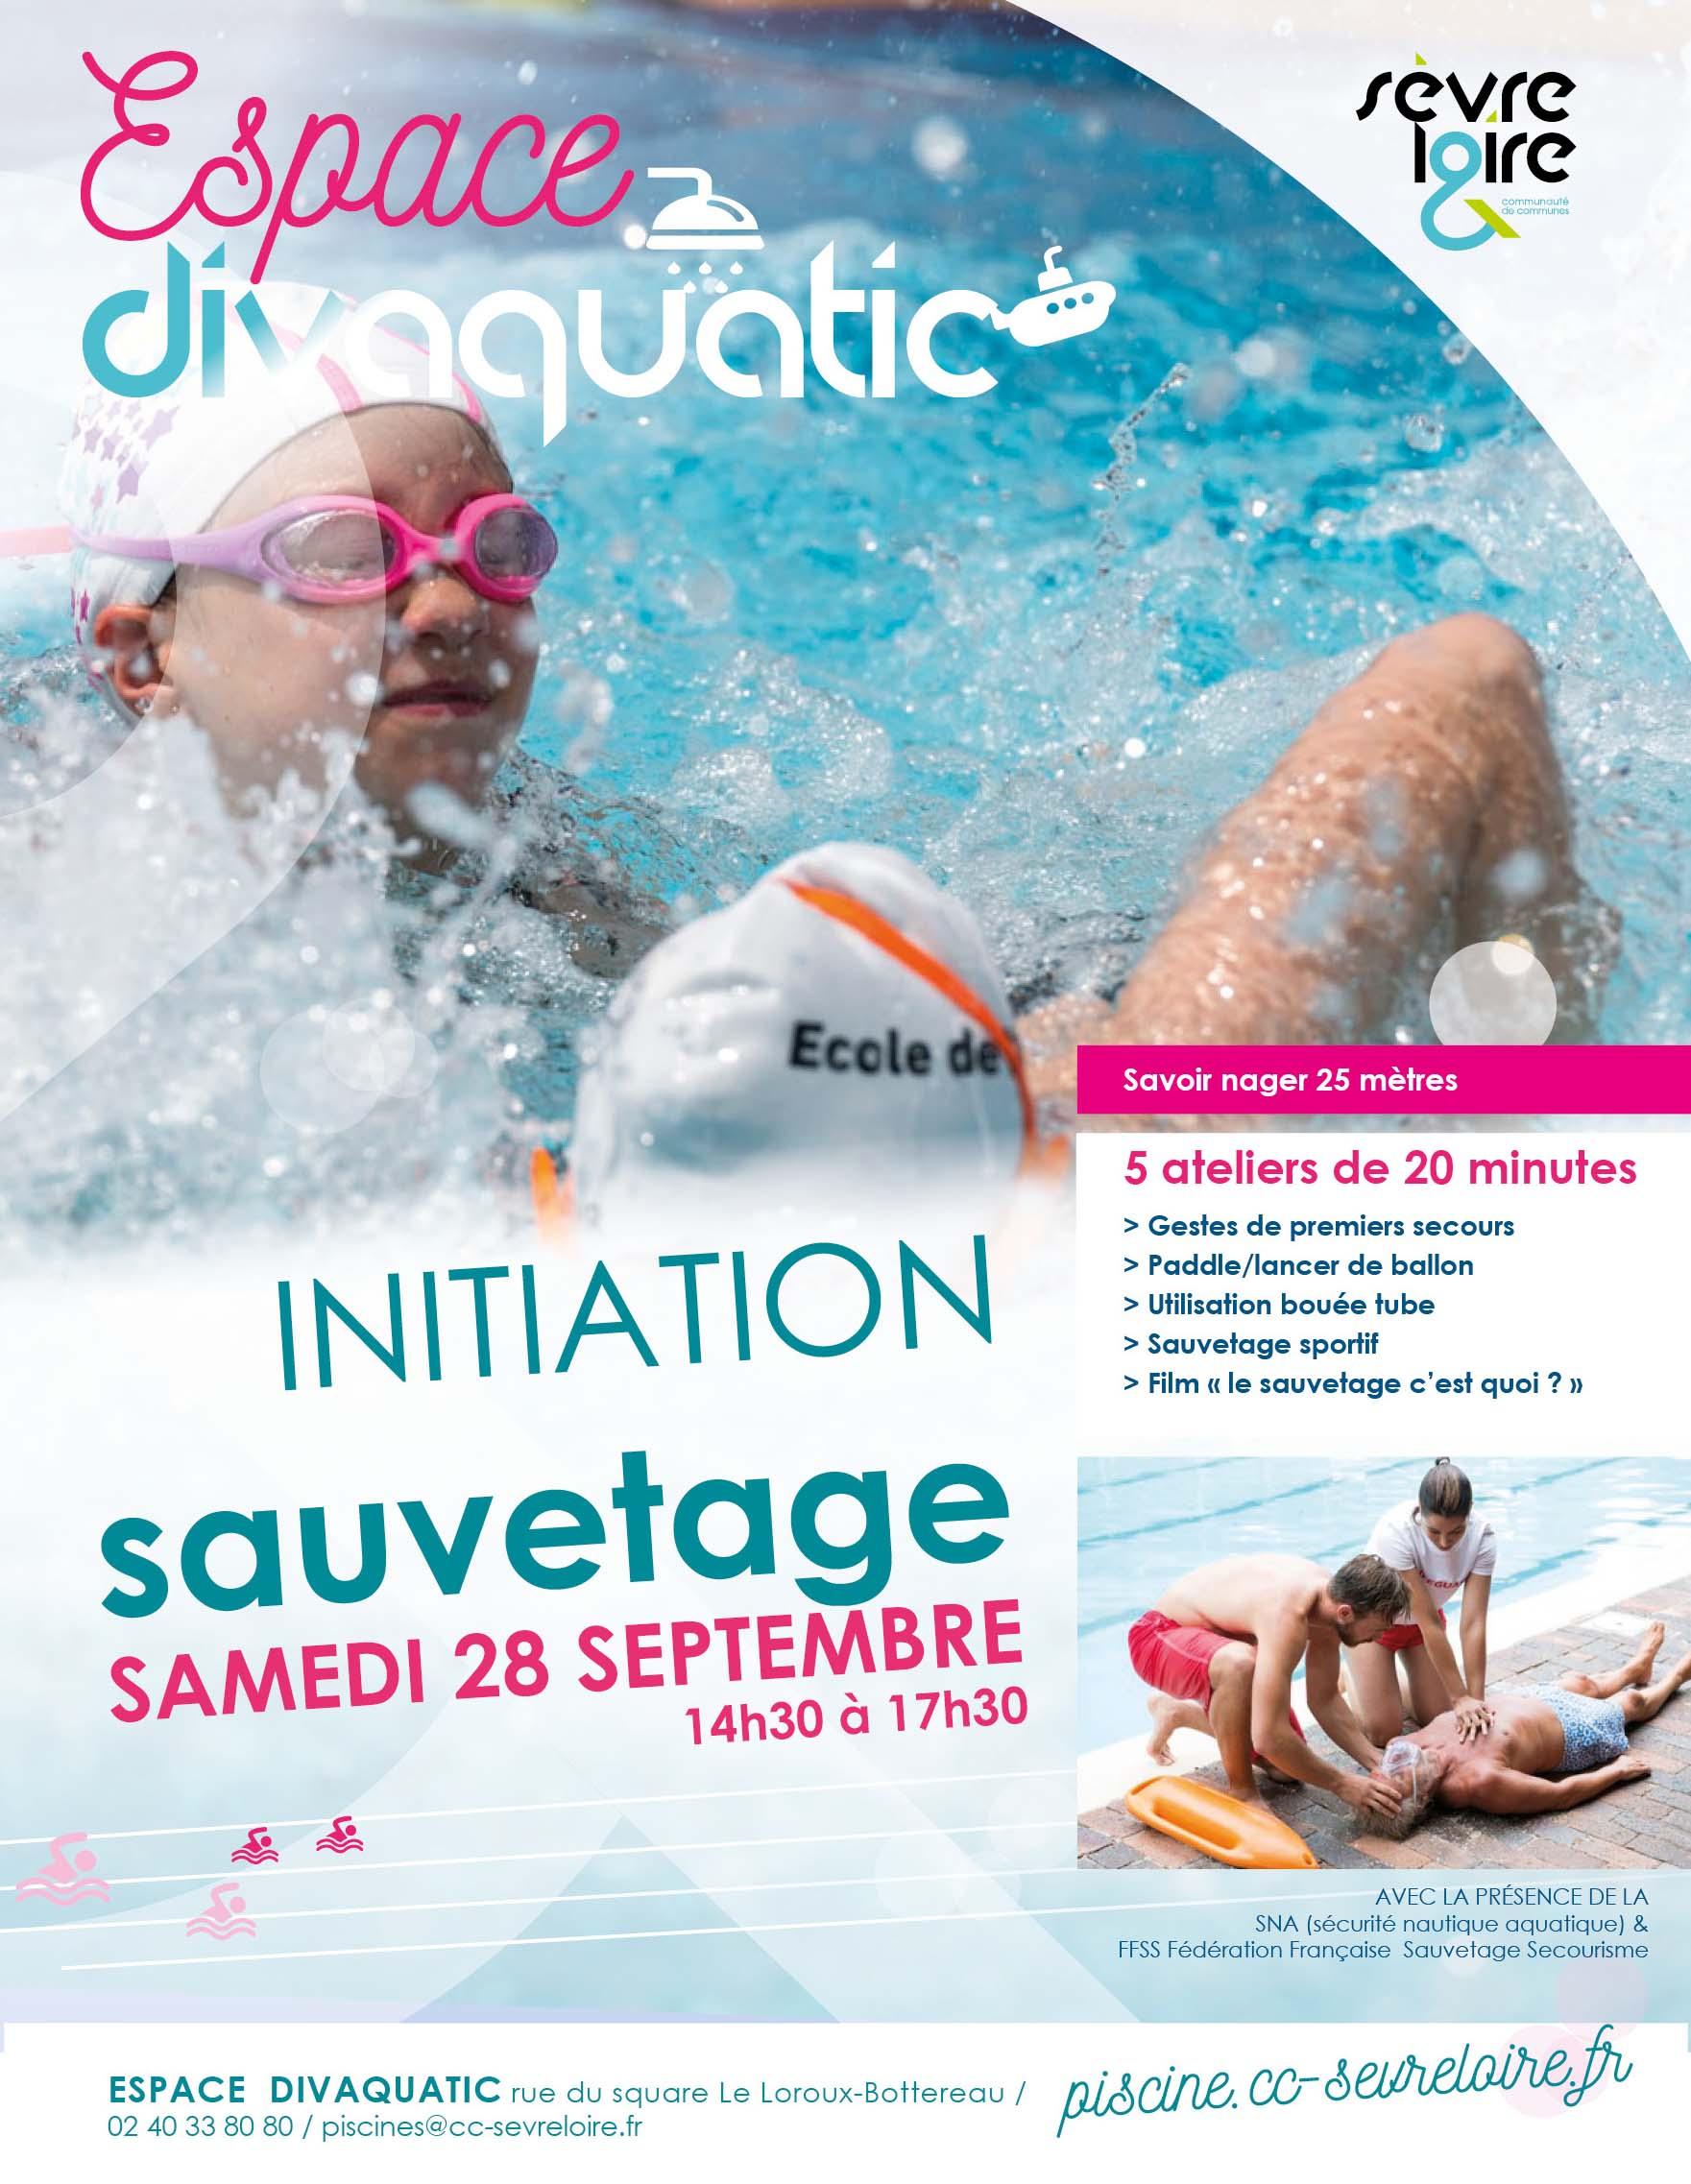 201909_event-initiation-sauvetage-divaquatic_bd